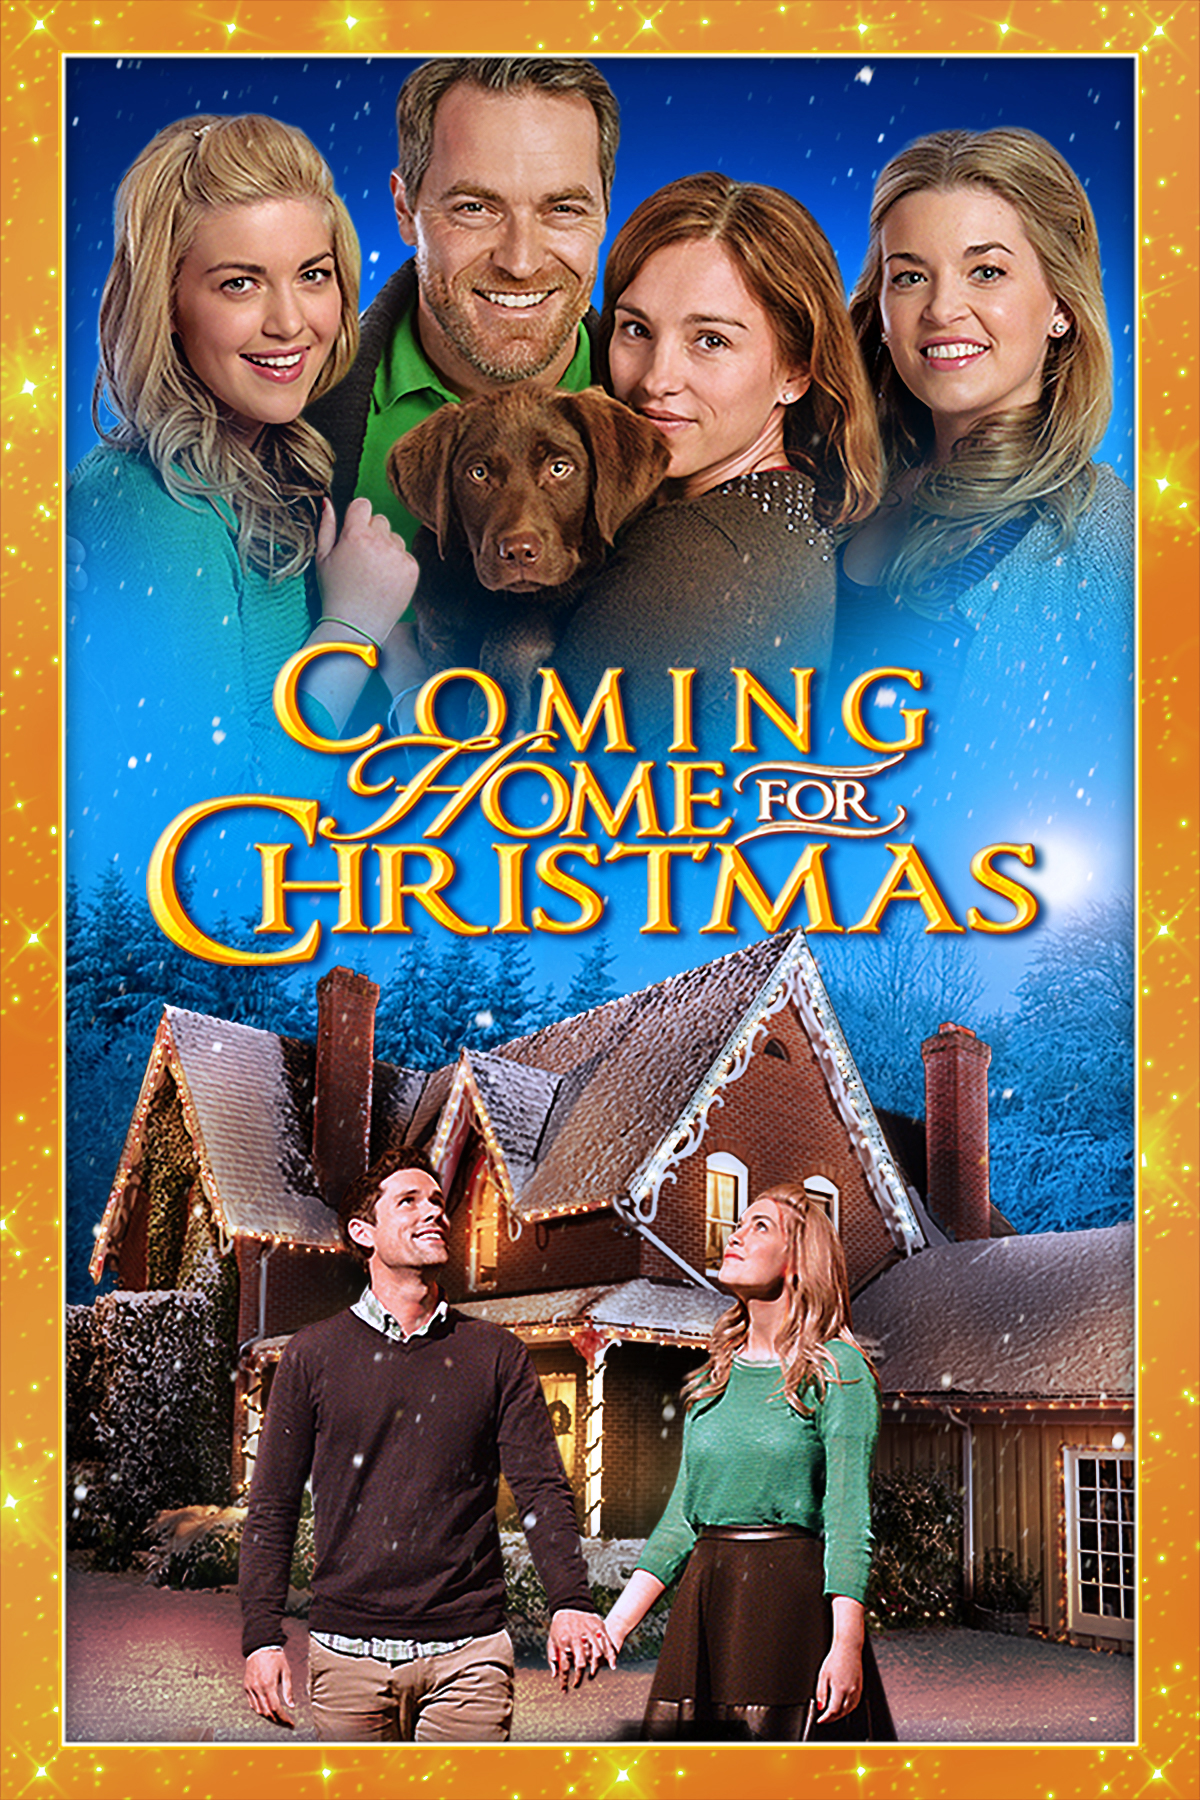 Cominghomeforchristmas_2x3